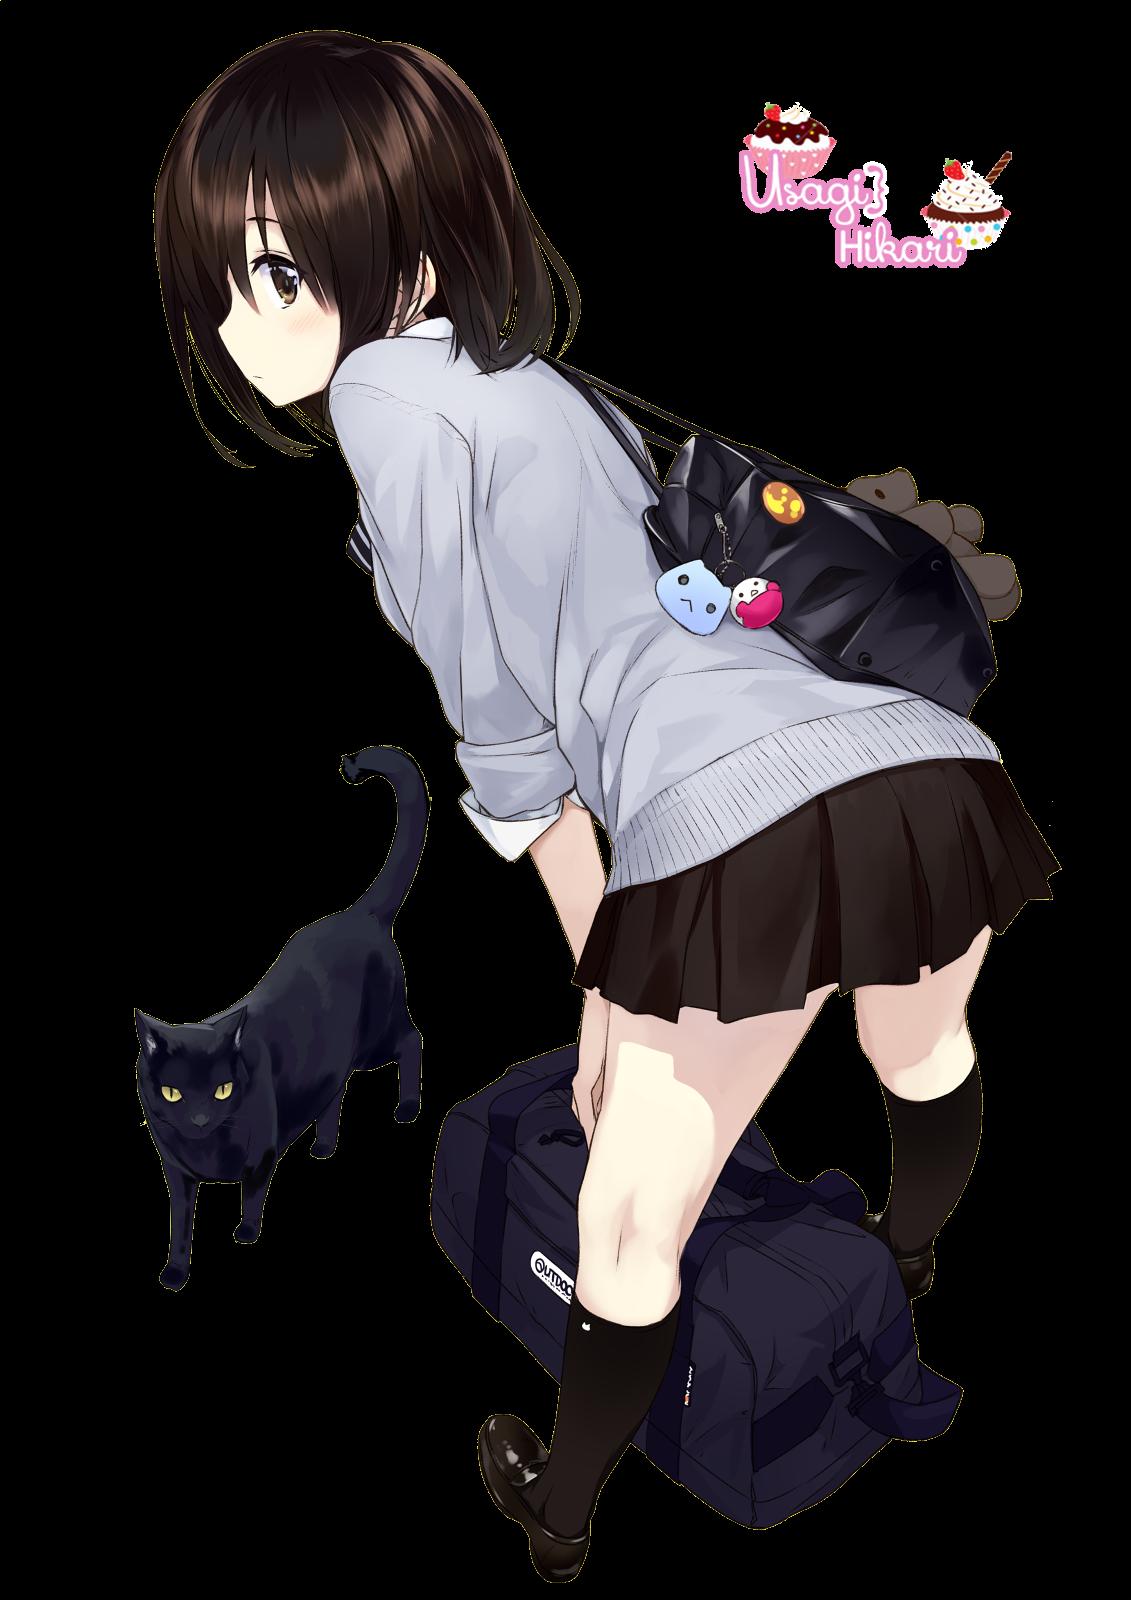 Ilustracion Anime